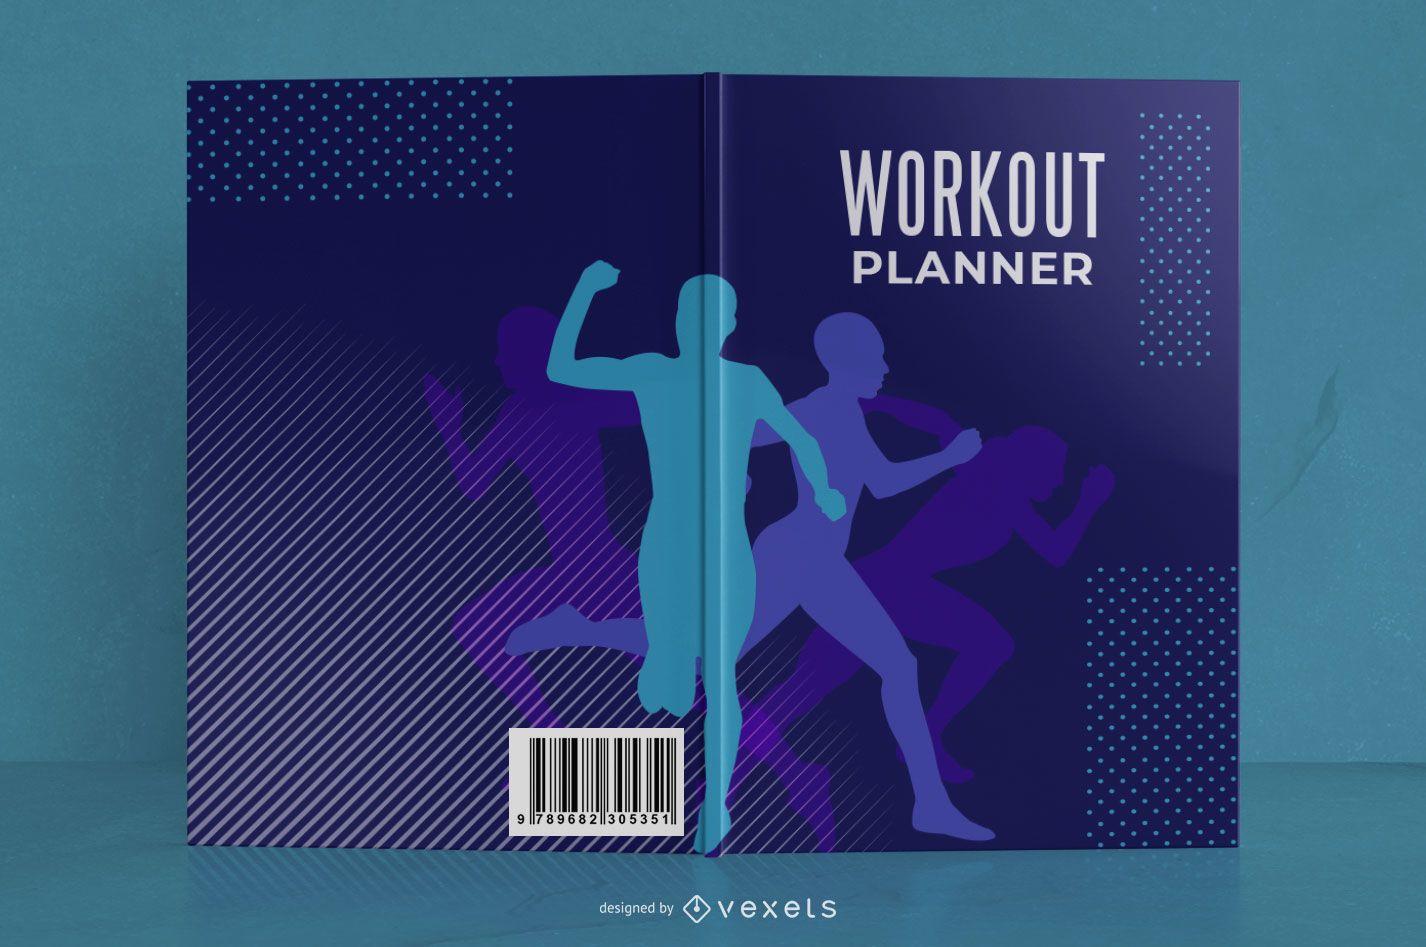 Dise?o de portada de libro de planificador de entrenamiento